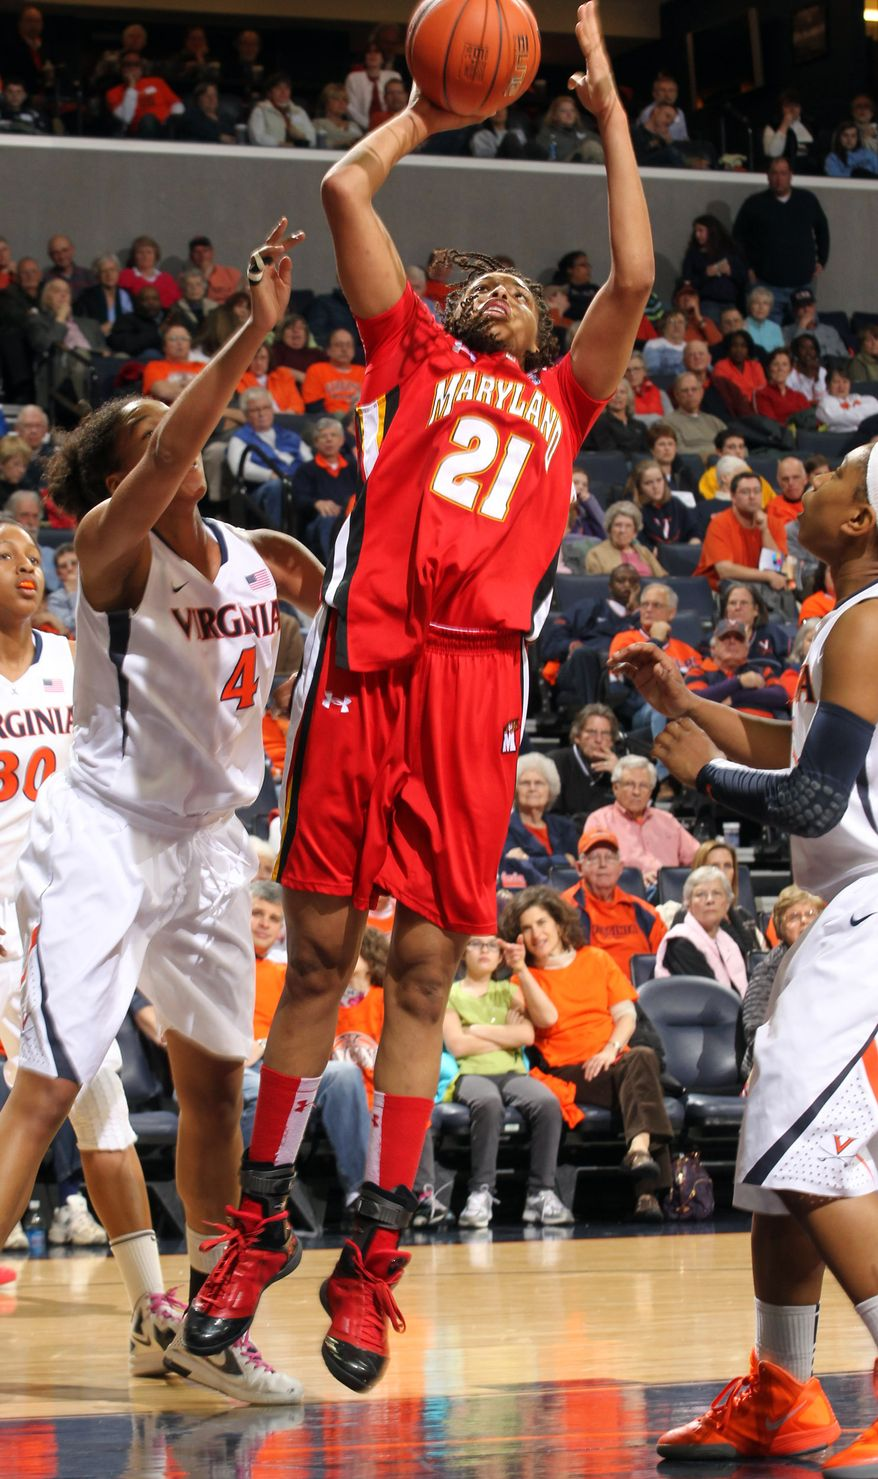 Maryland forward Tianna Hawkins shoots over Virginia center Simone Egwu during the first half Thursday, Feb. 16, 201,2 in Charlottesville, Va. (AP Photo/Andrew Shurtleff)